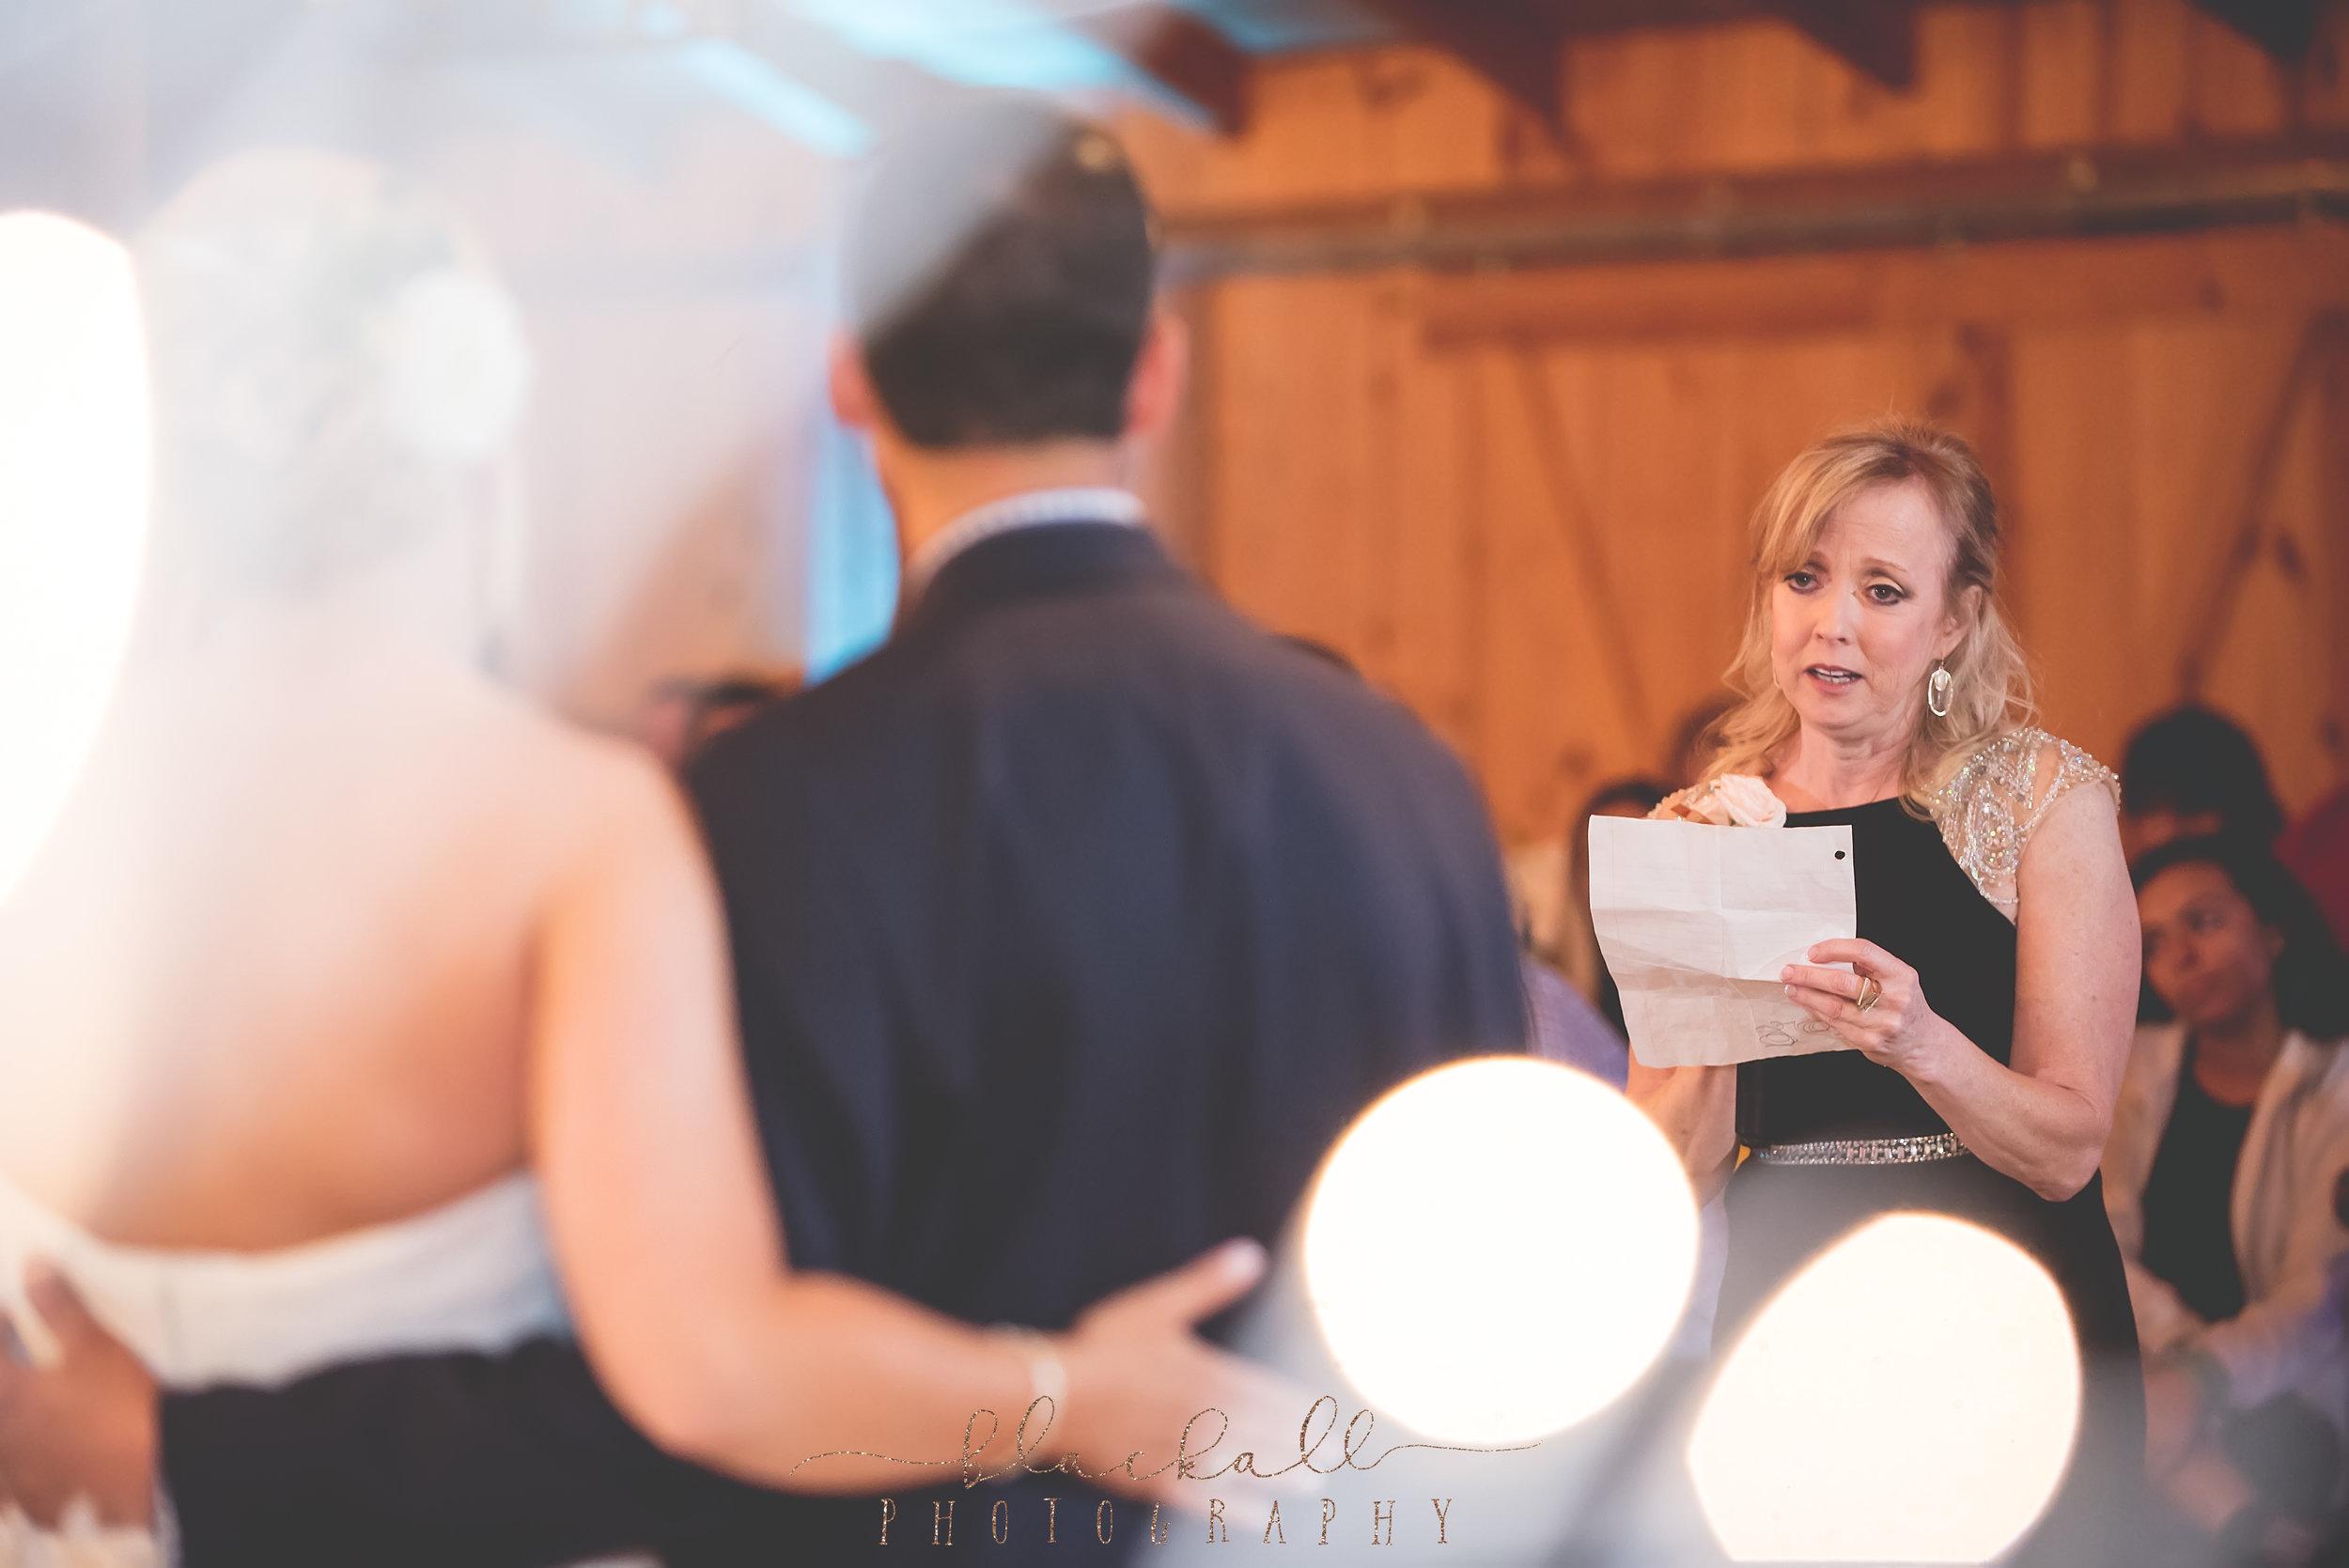 M&M WEDDING_Blackall Photography-72.JPG